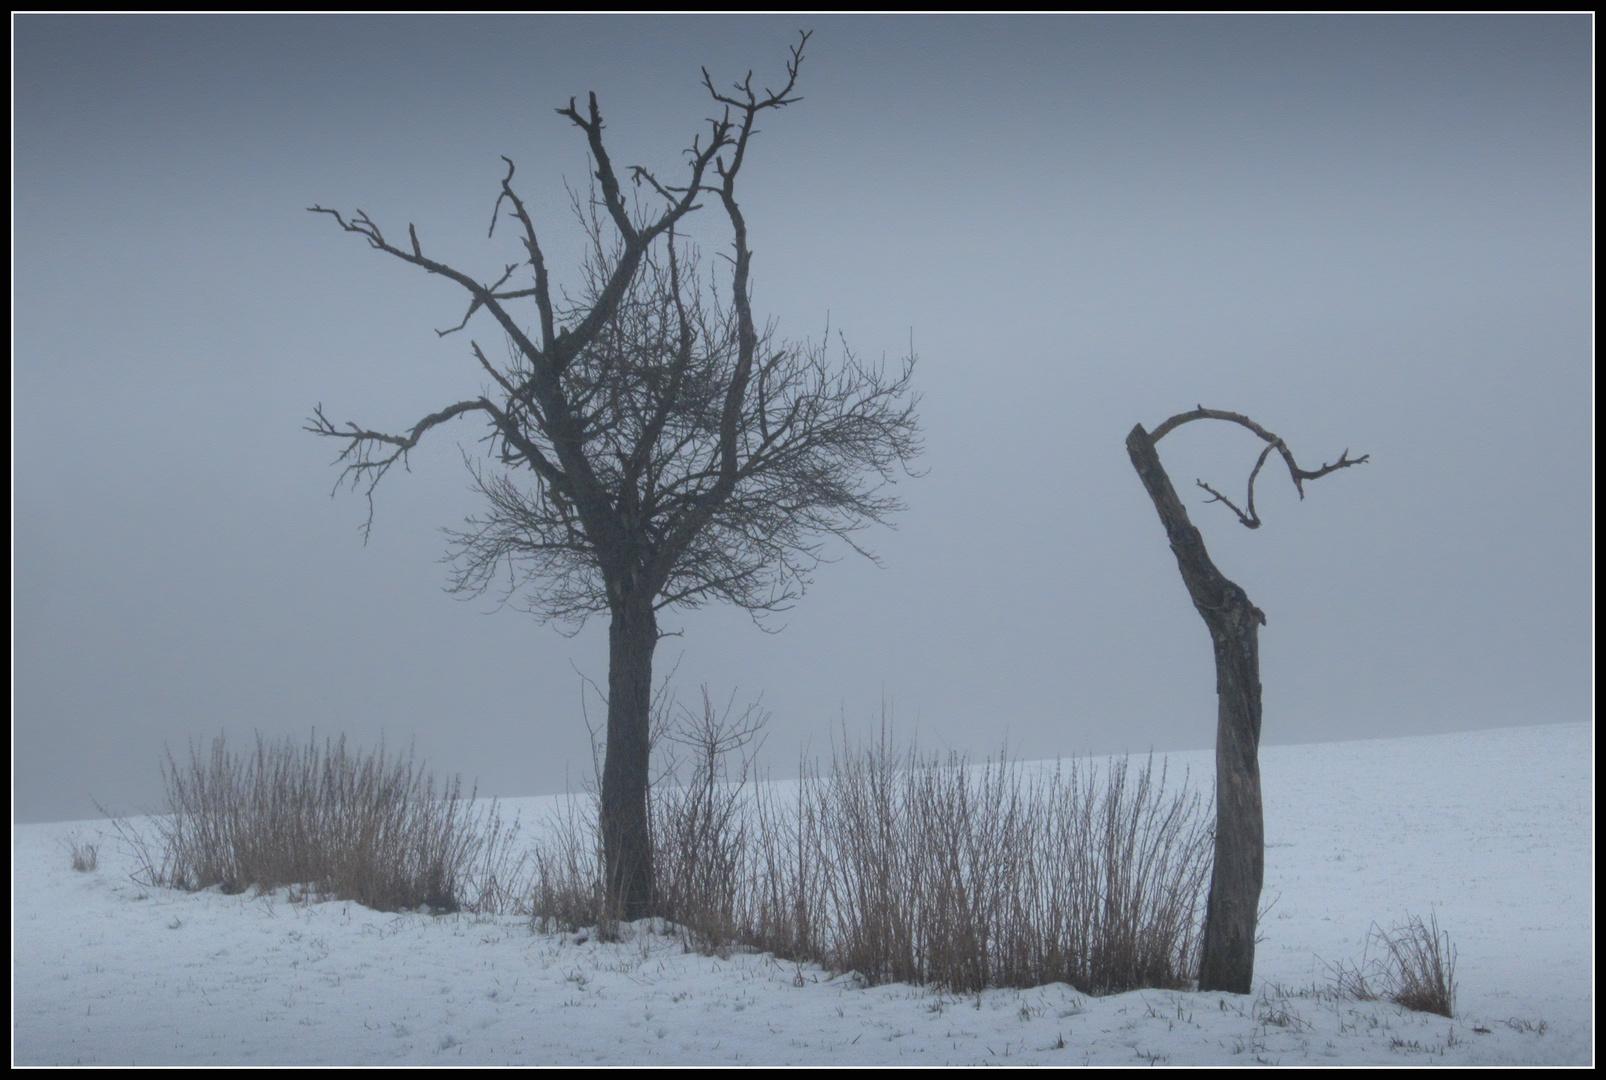 Winter - Impression 5